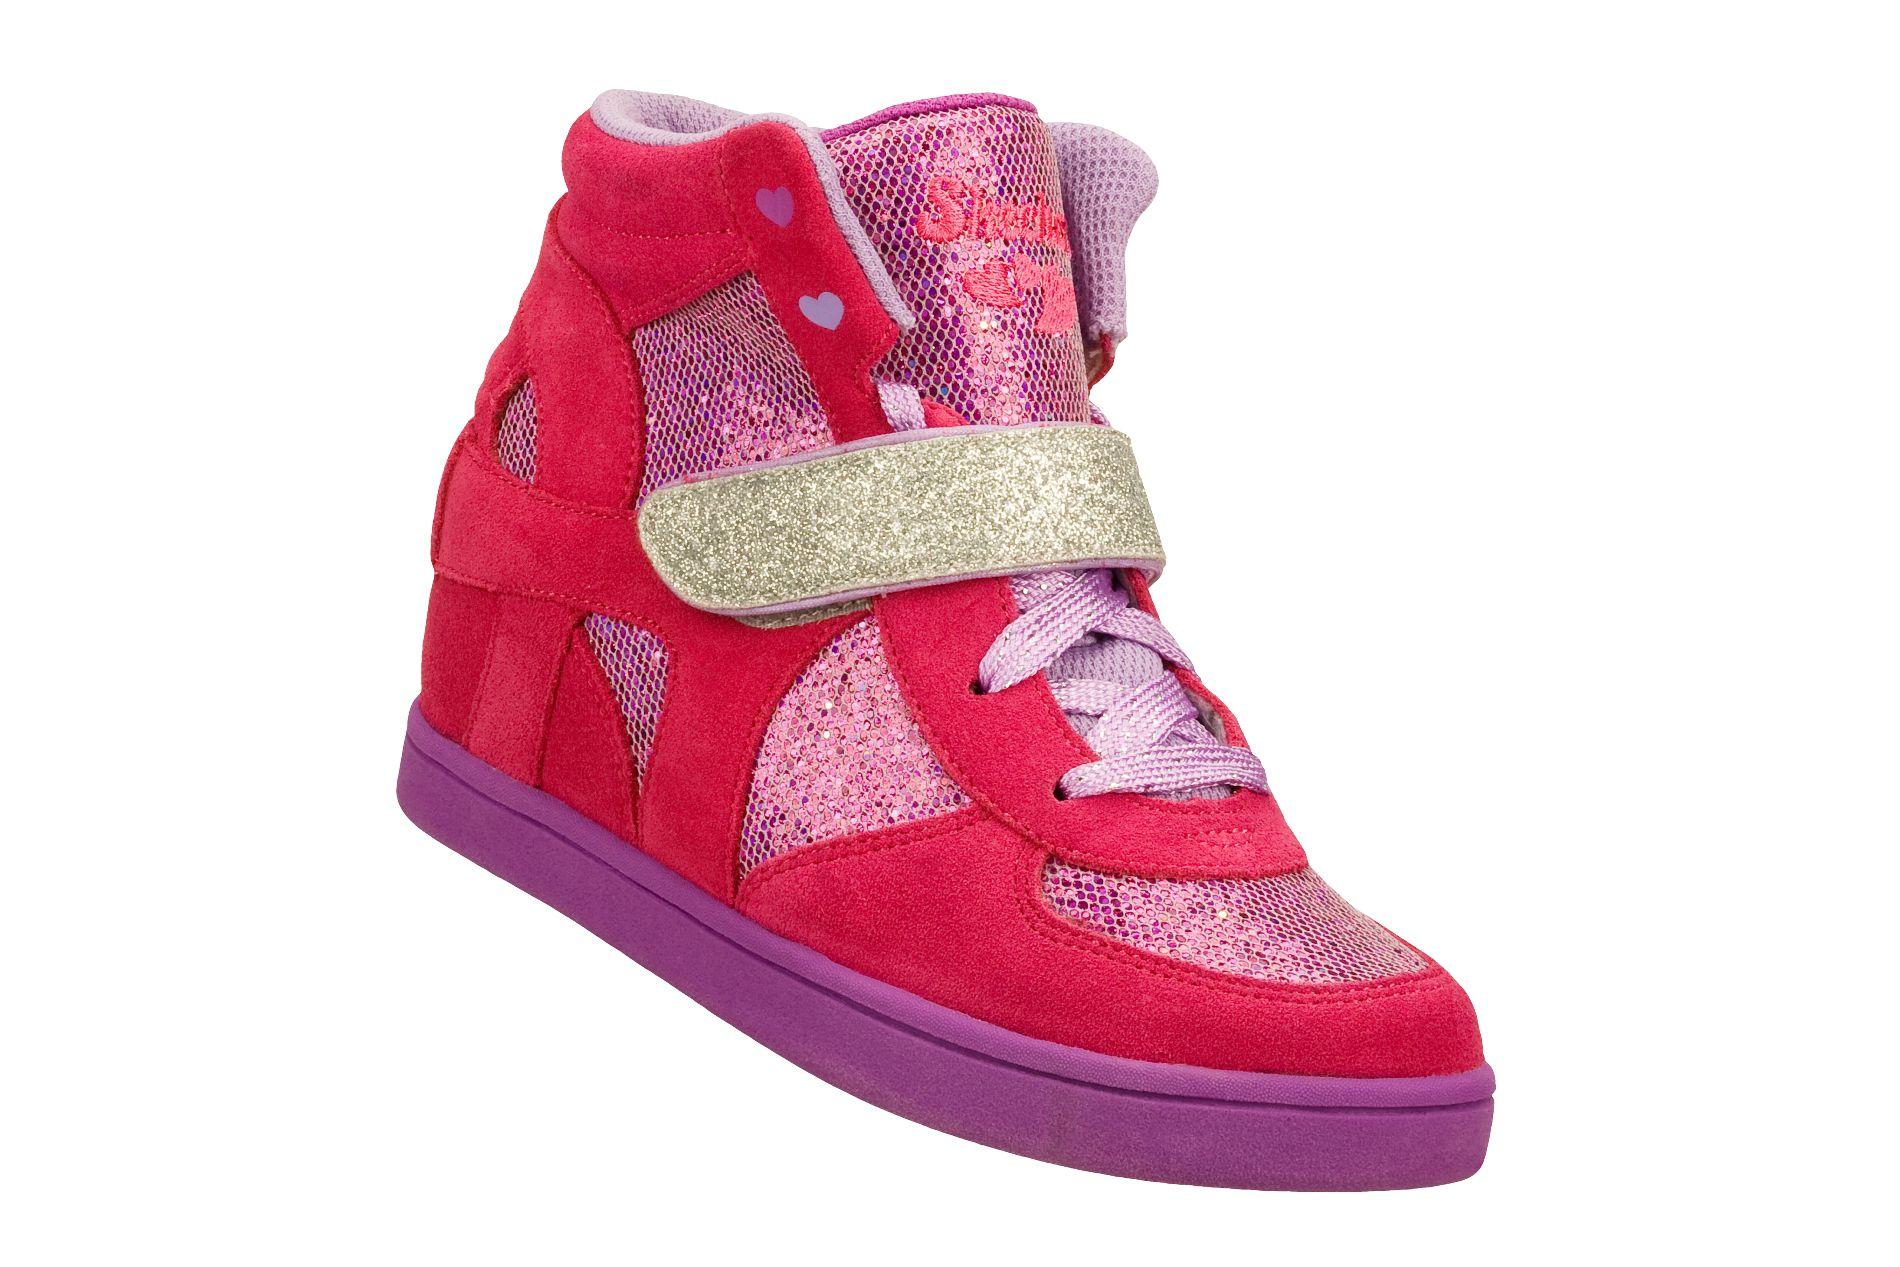 Skechers Girl S Pretty Plus 2 Fashion Wedge Sneaker Pink